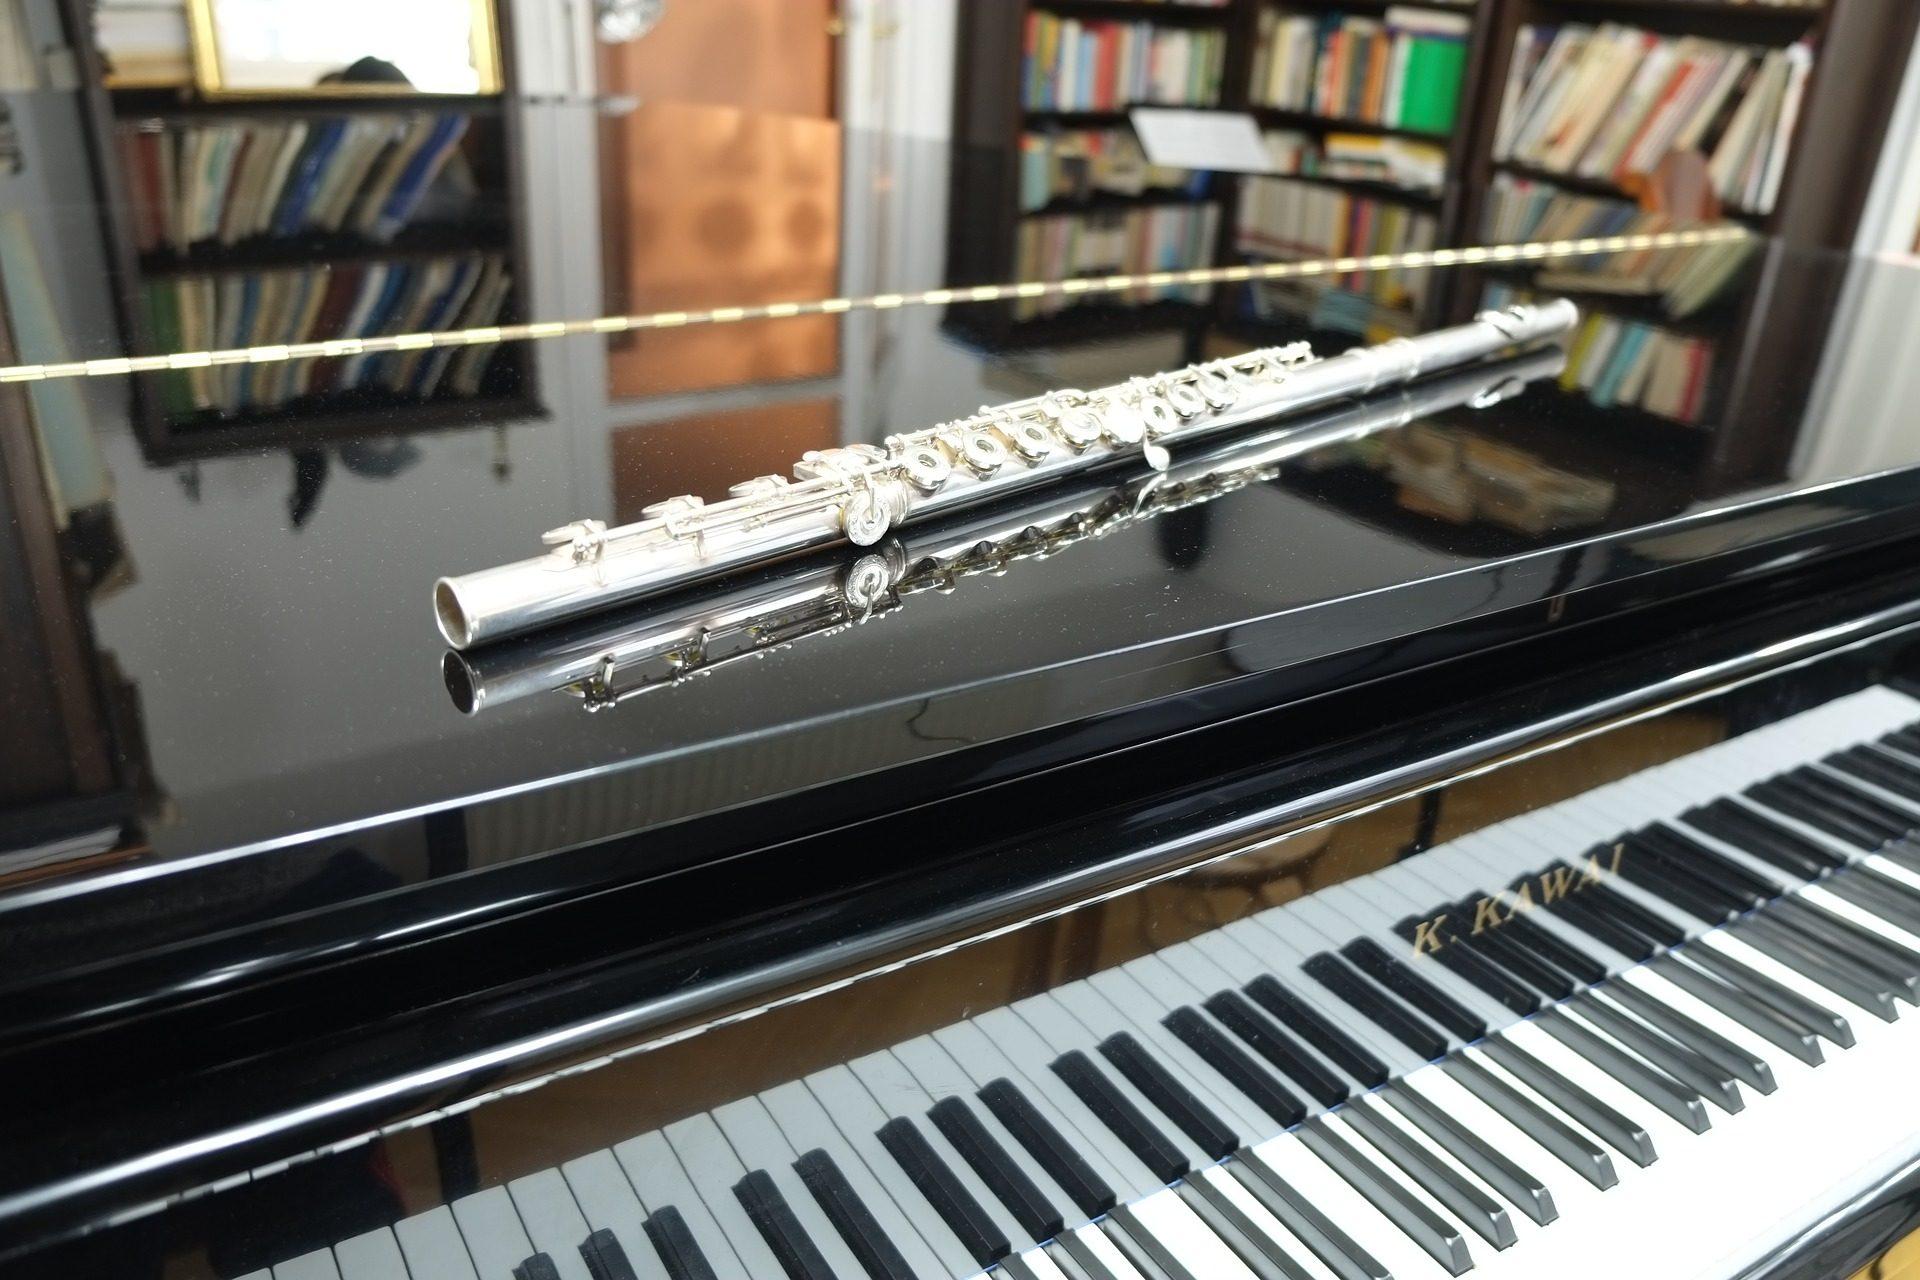 pianoforte, flauto, strumenti, chiavi, scaffalature, dischi - Sfondi HD - Professor-falken.com